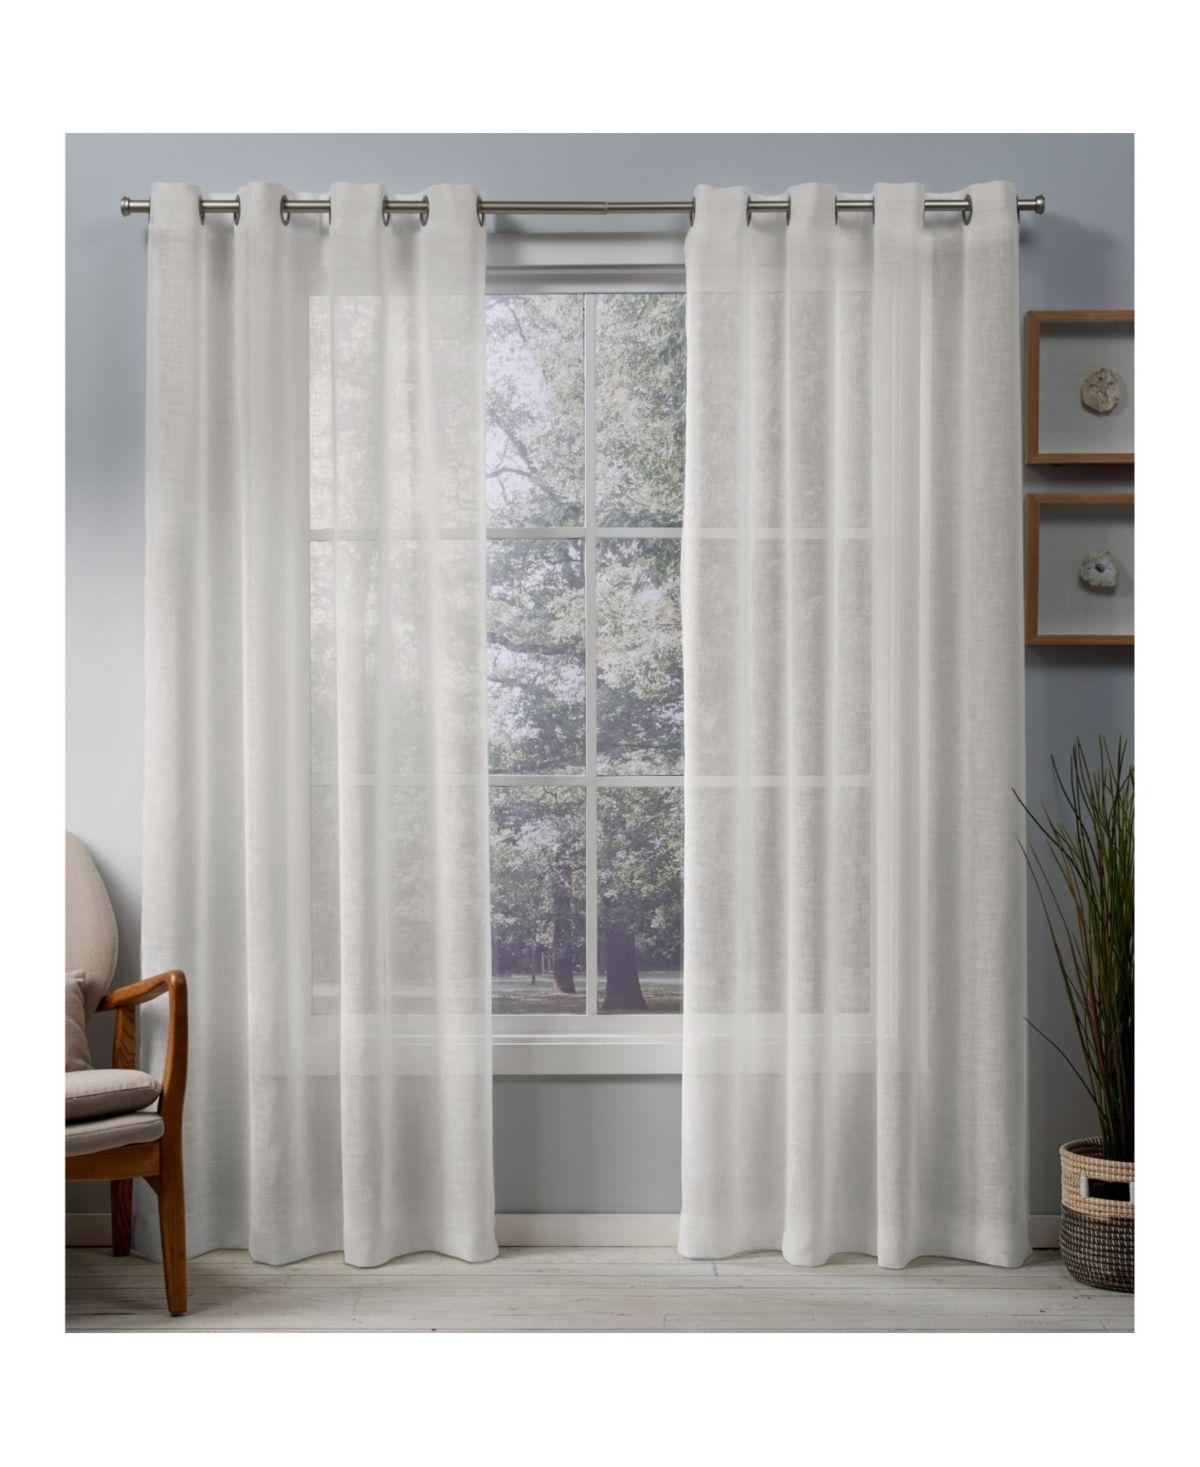 Exclusive Home Belgian Sheer Grommet Top Curtain Panel Pair 50 X